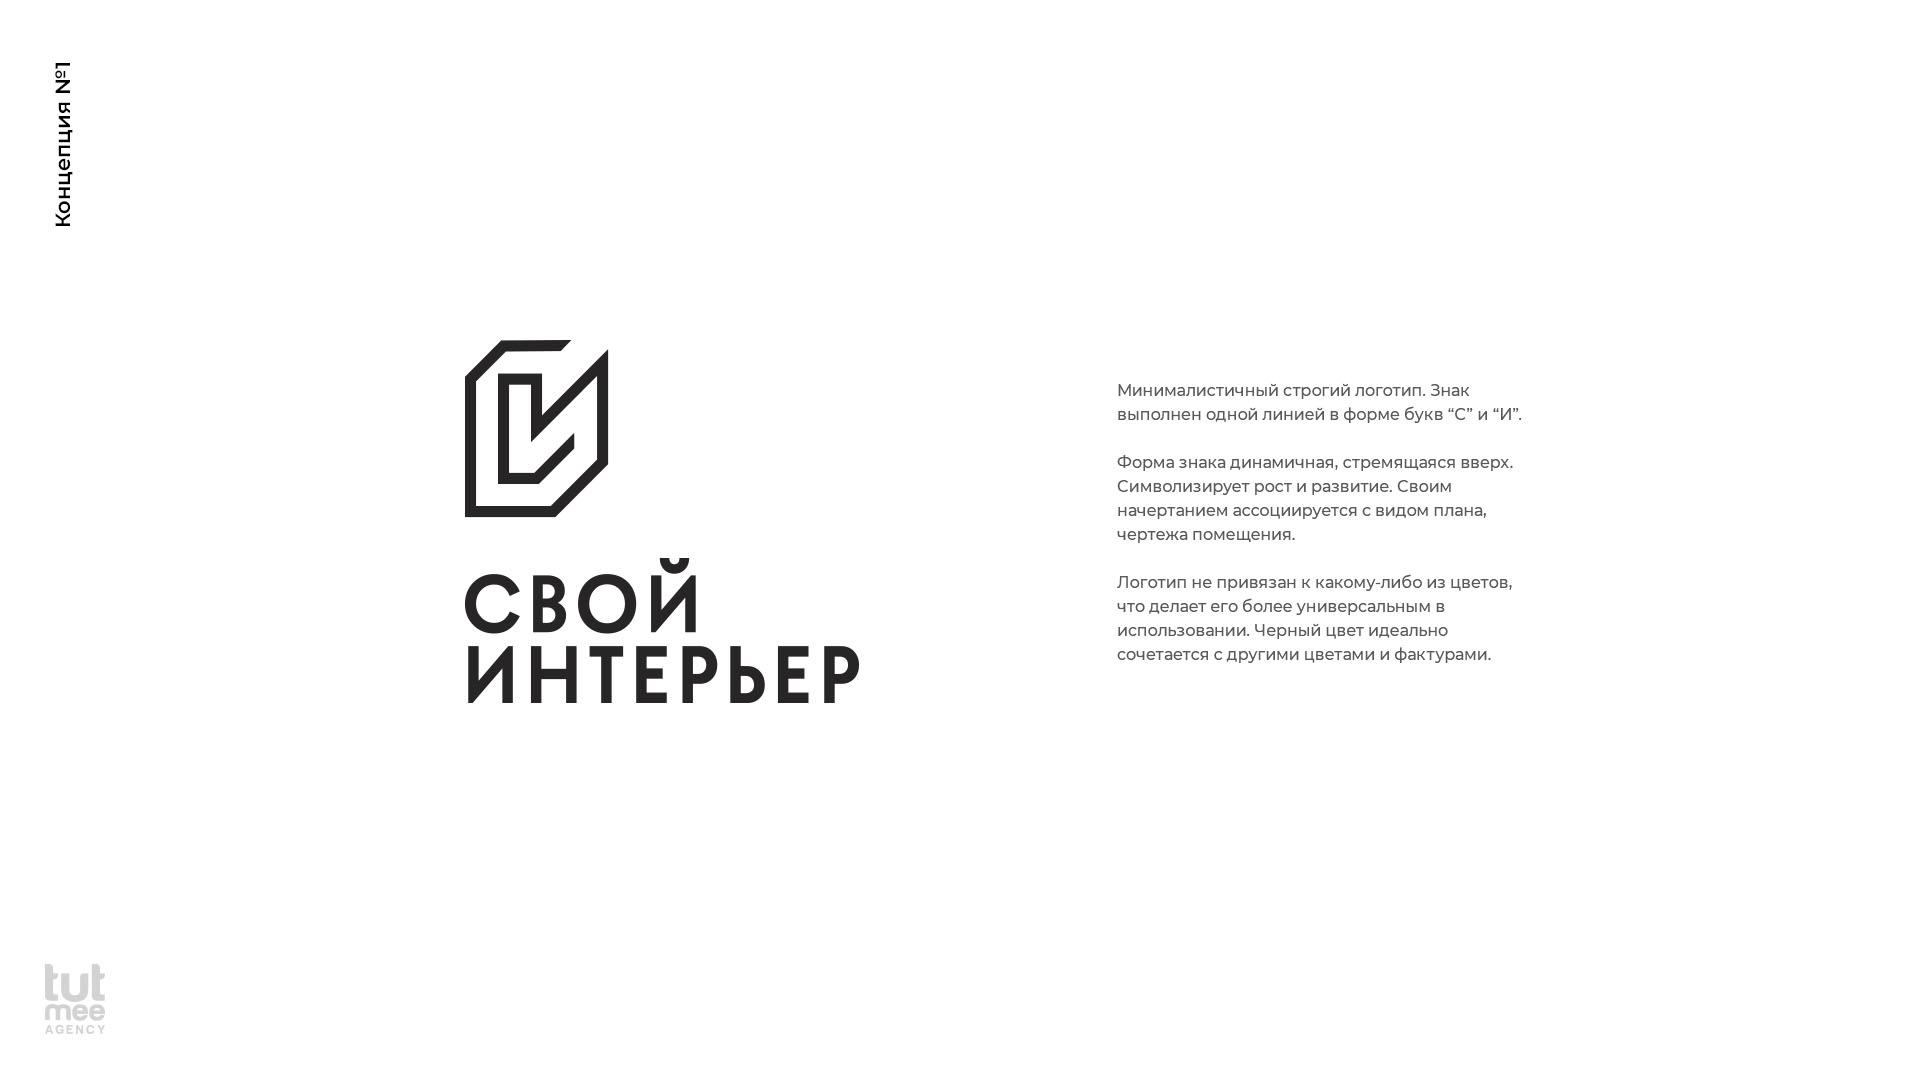 Свой интерьер - Логотип